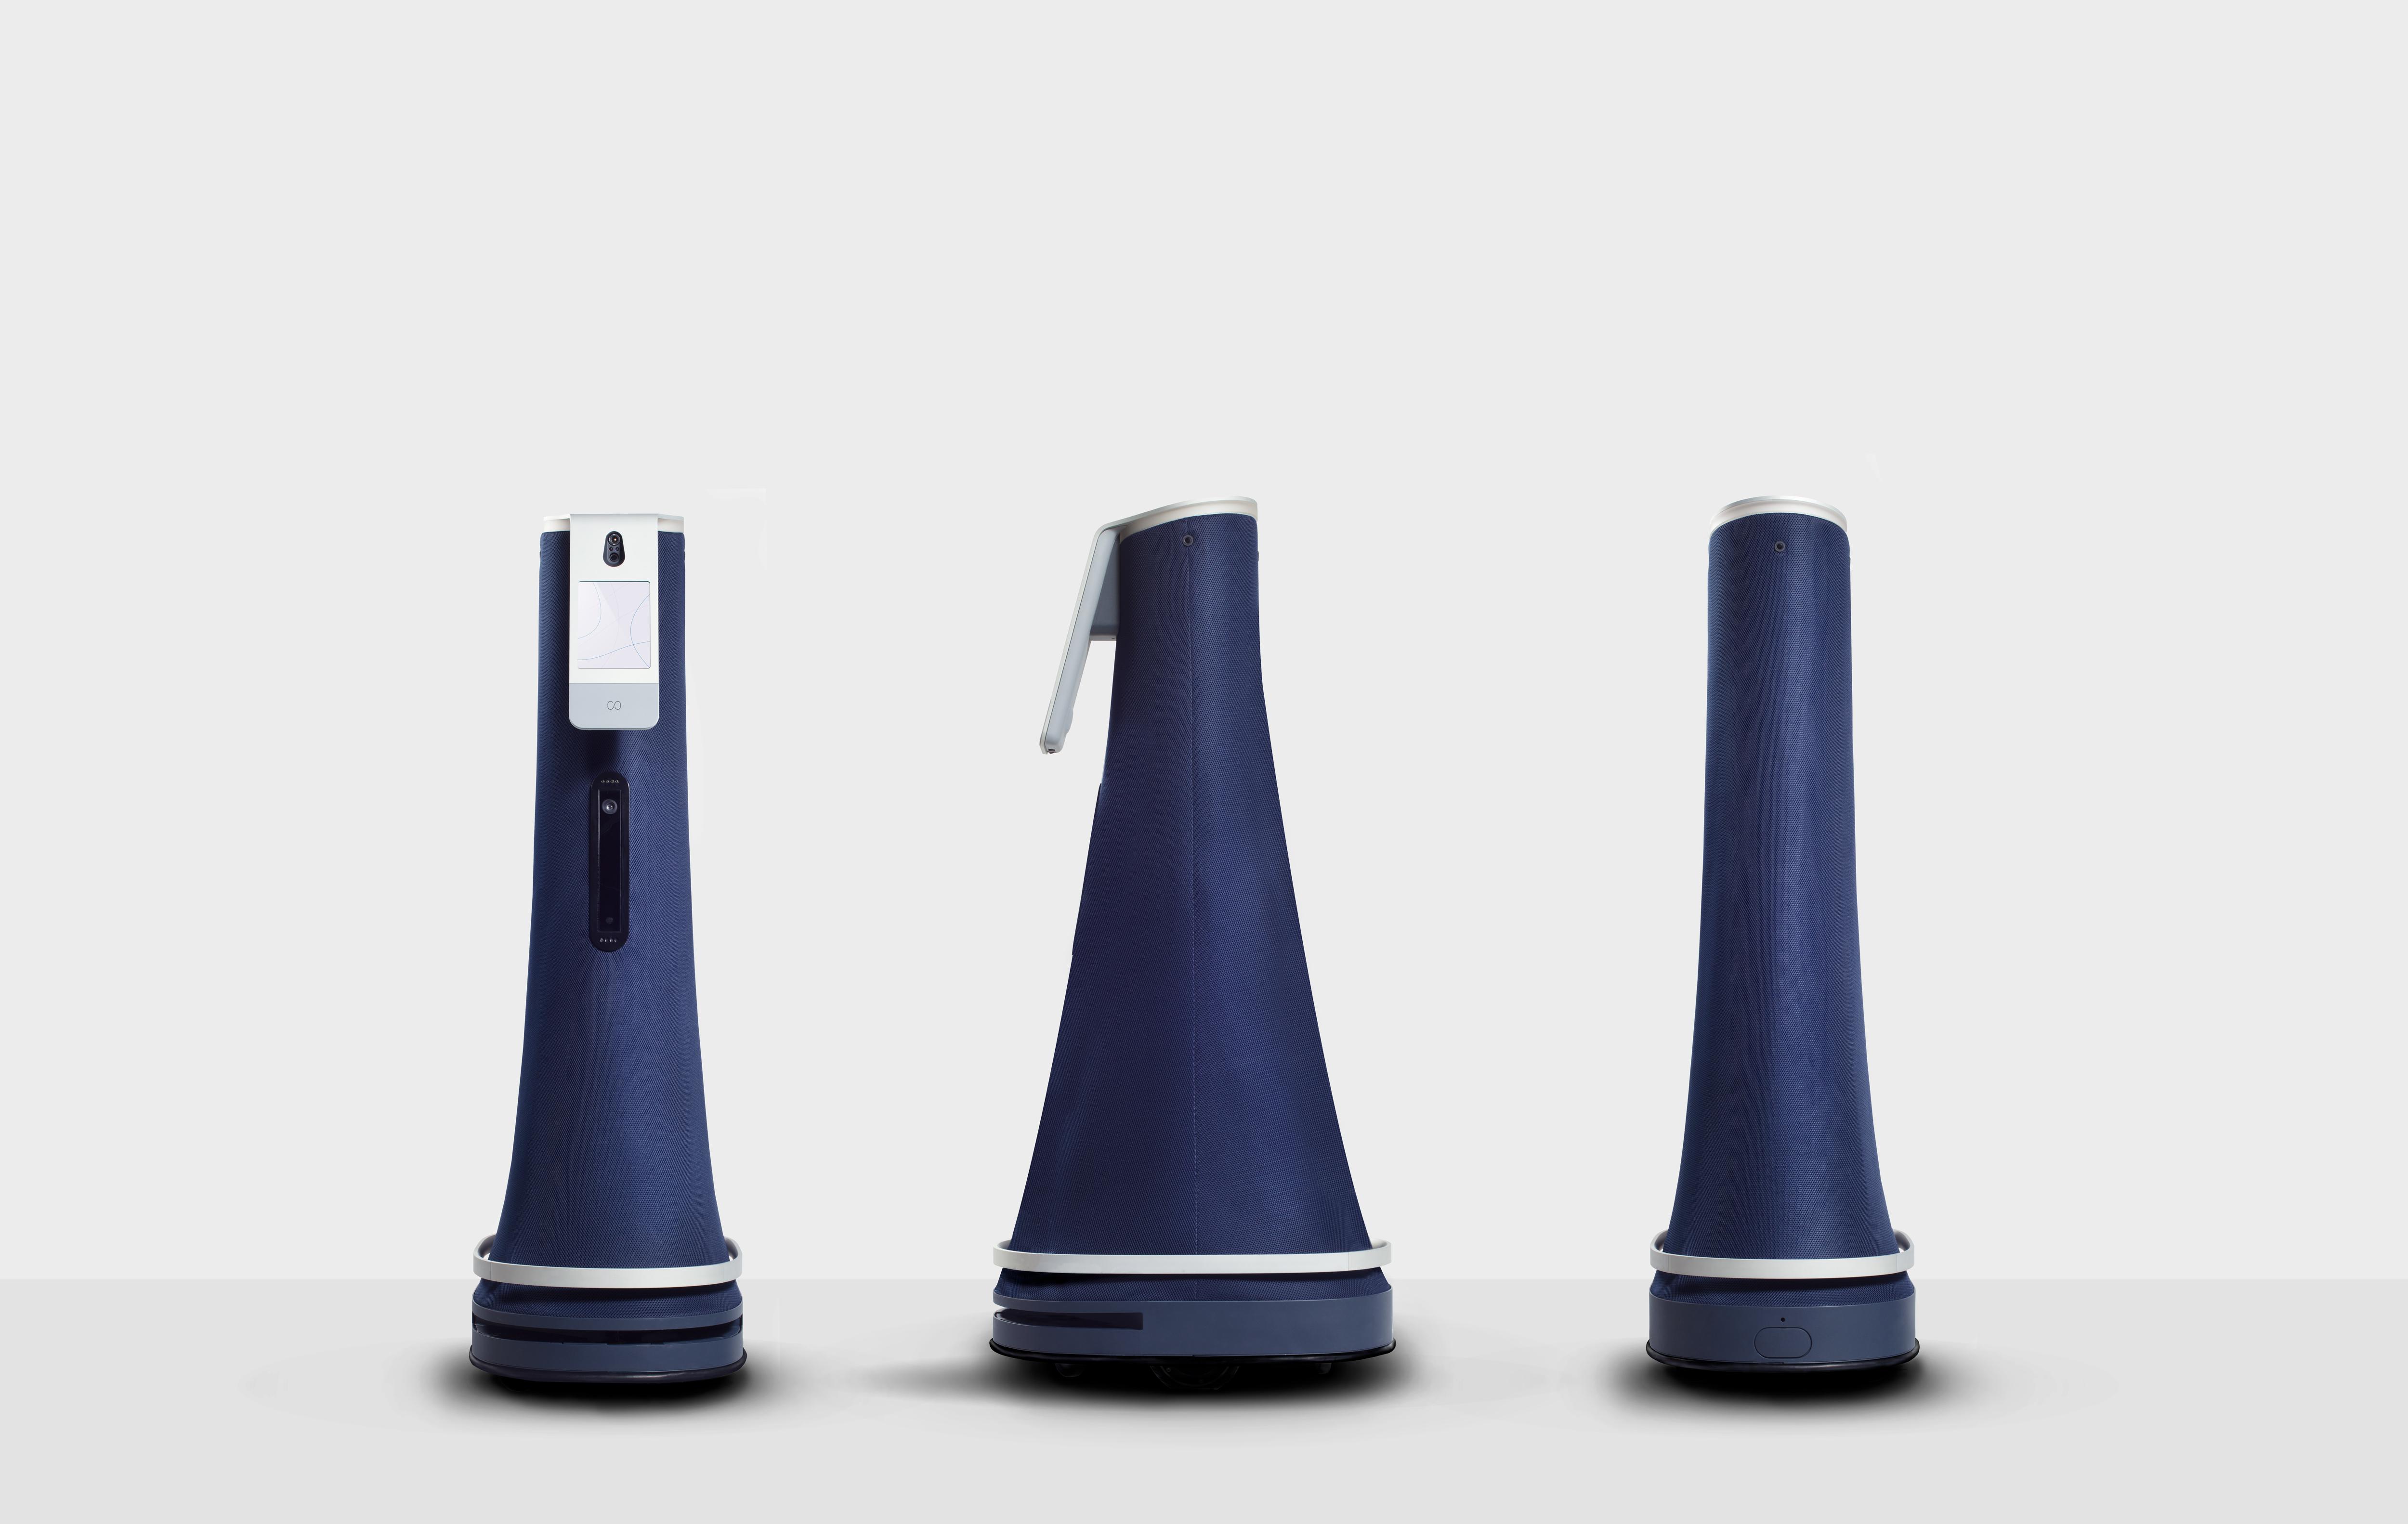 three Cobalt security robots